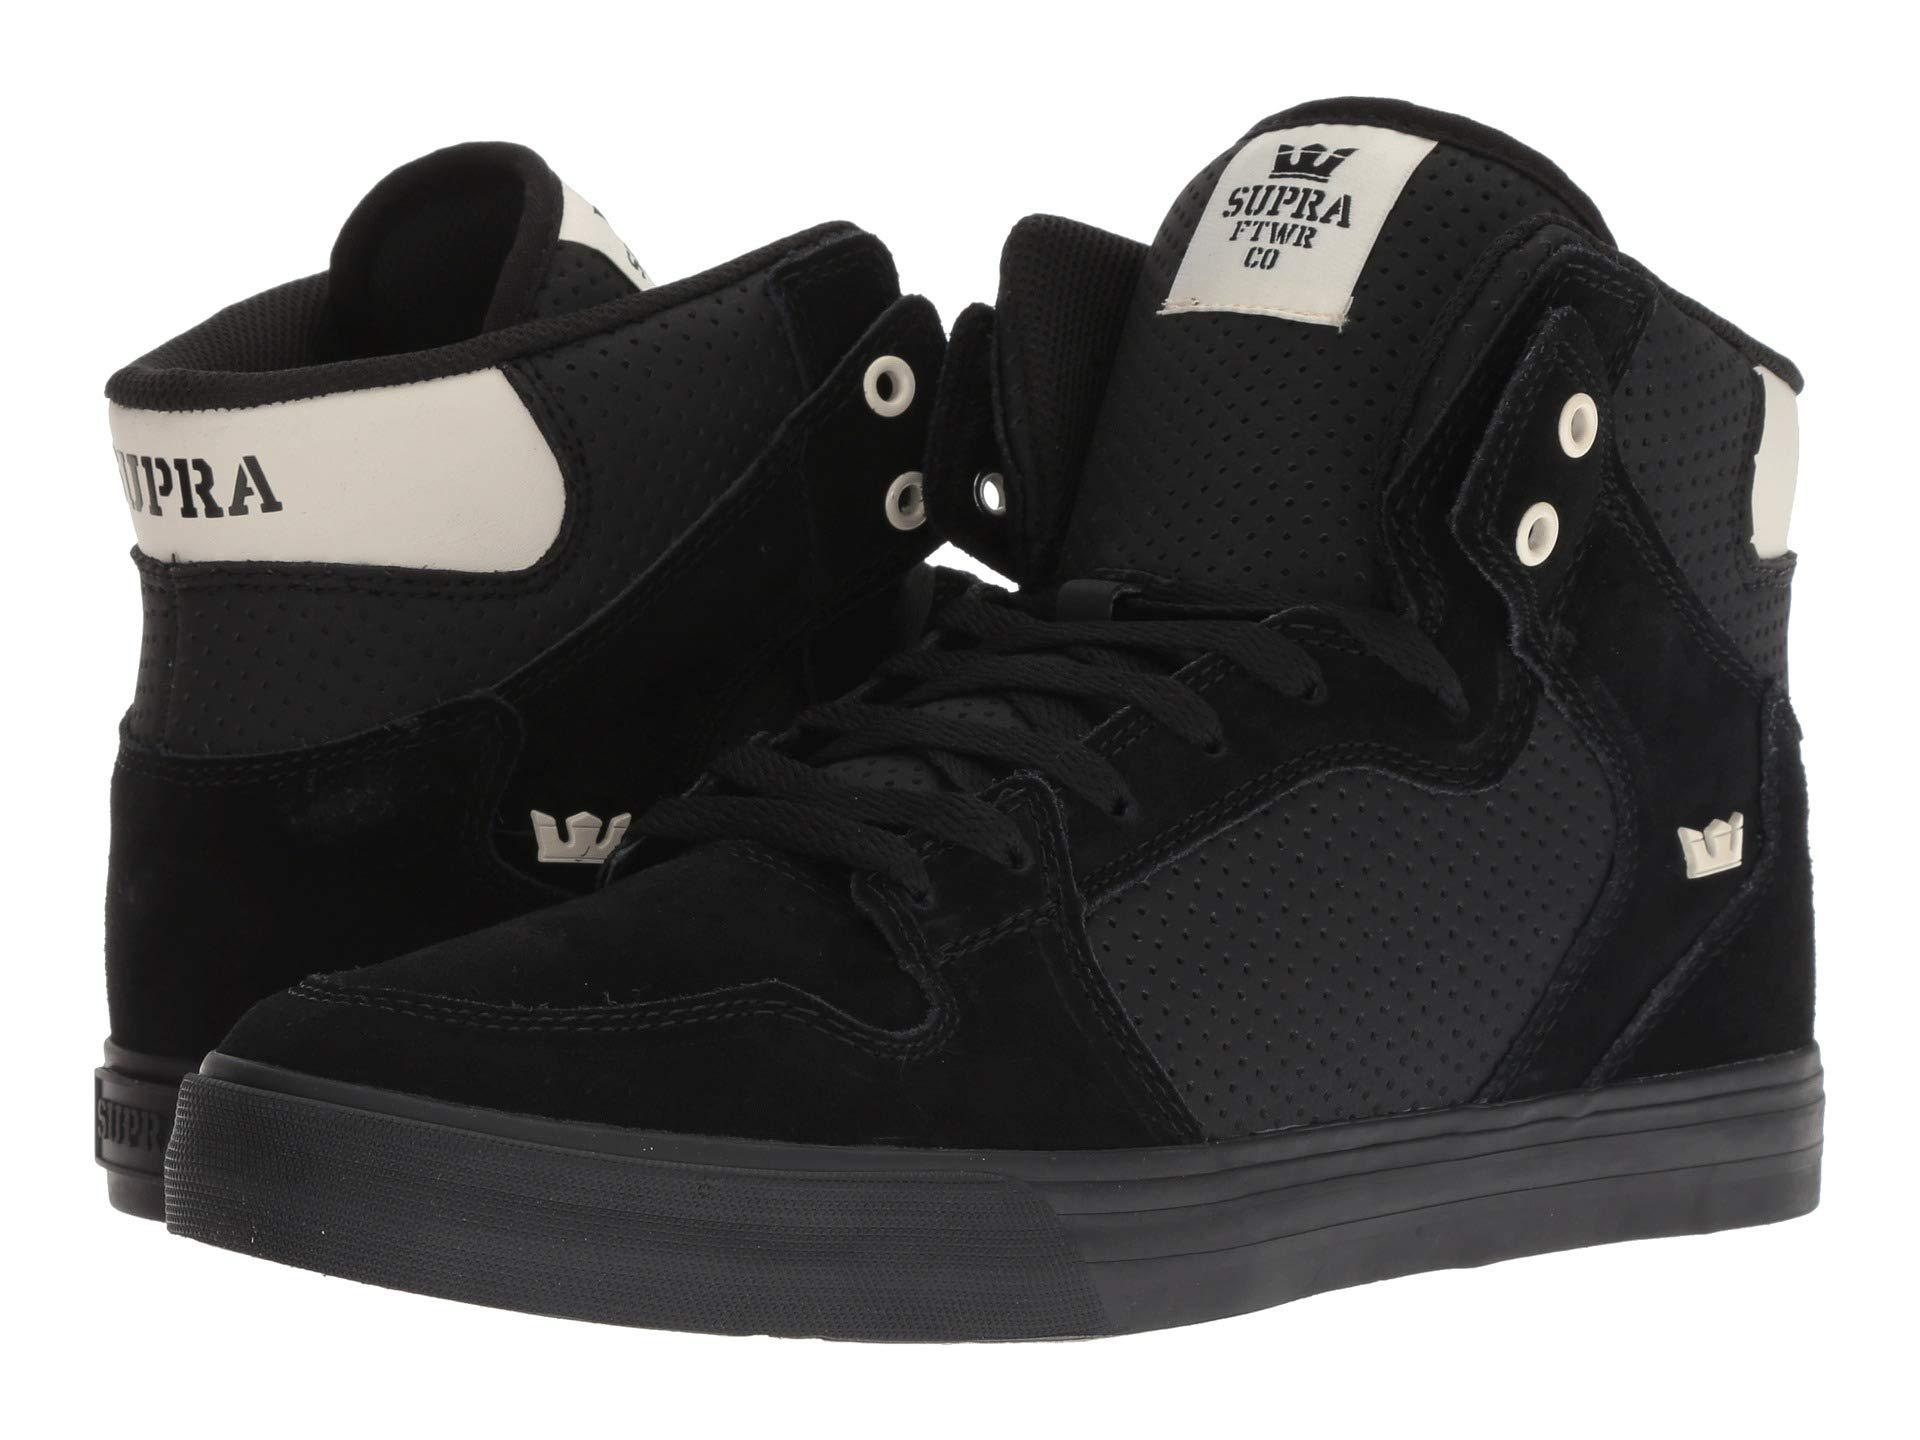 02ac27d0c231 Lyst - Supra Vaider (black off-white black) Men s Shoes in Black for Men